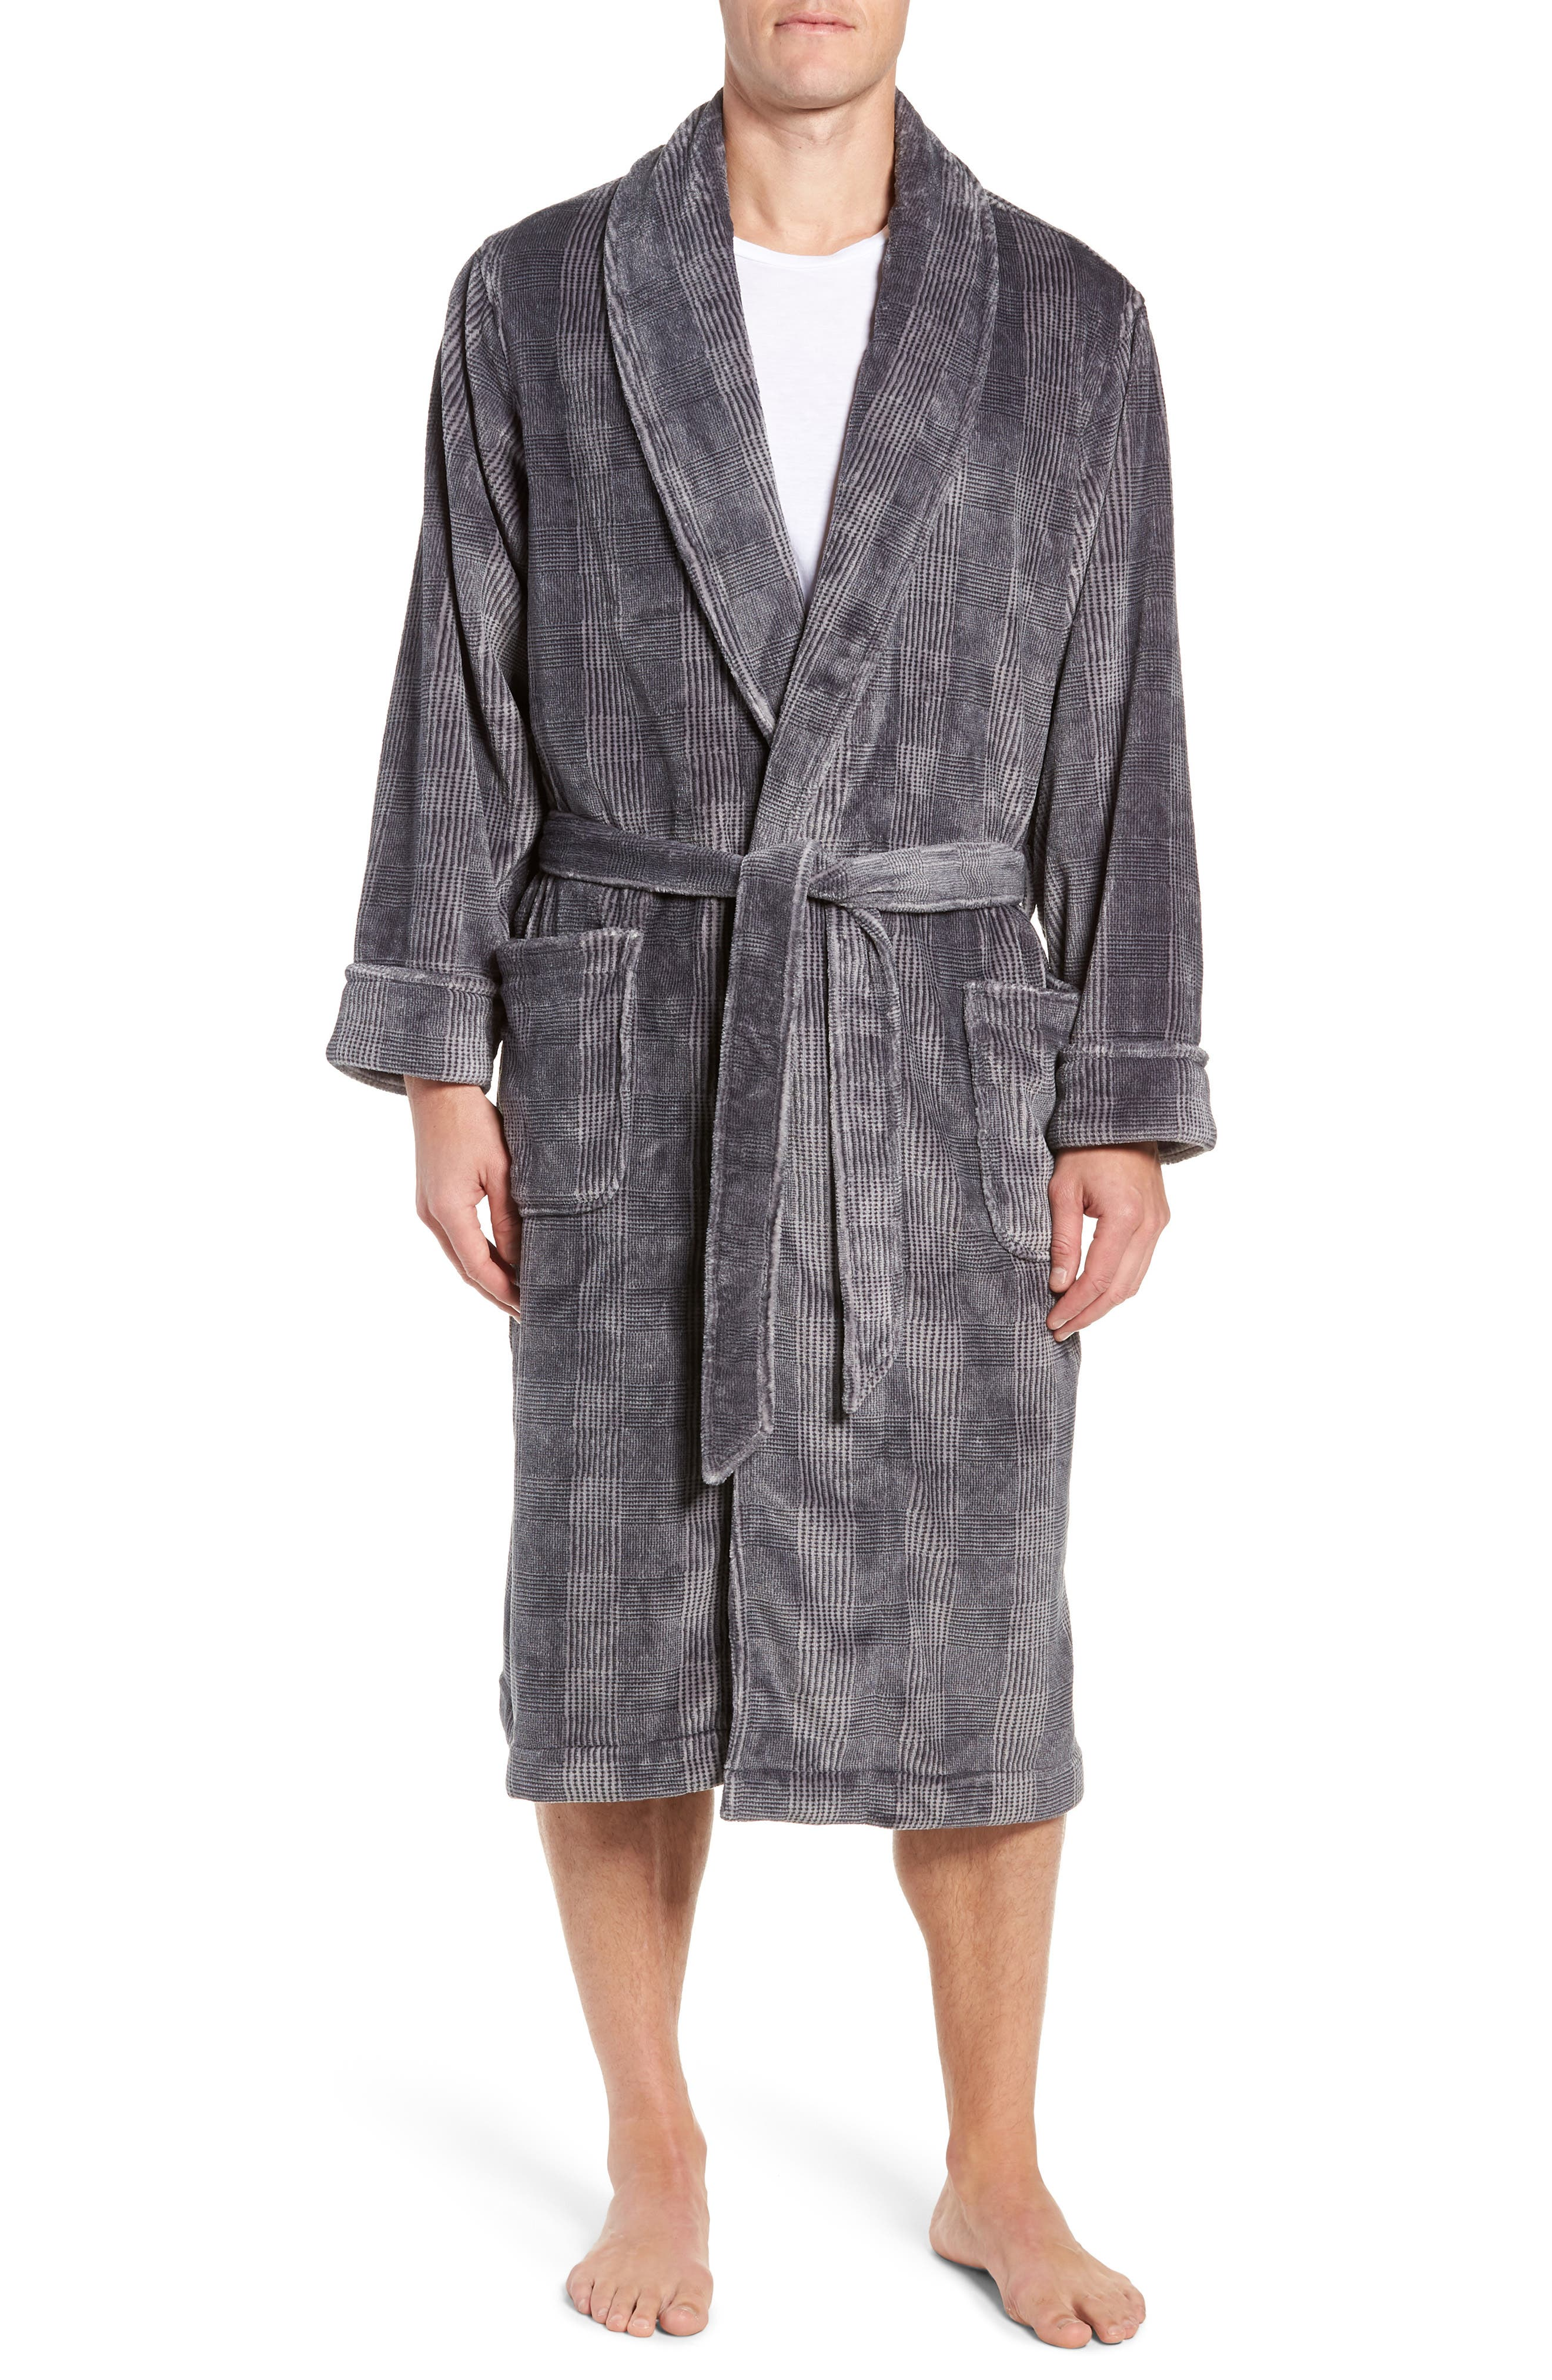 Glen Check Fleece Robe,                             Main thumbnail 1, color,                             BLACK - CHARCOAL GLEN CHECK